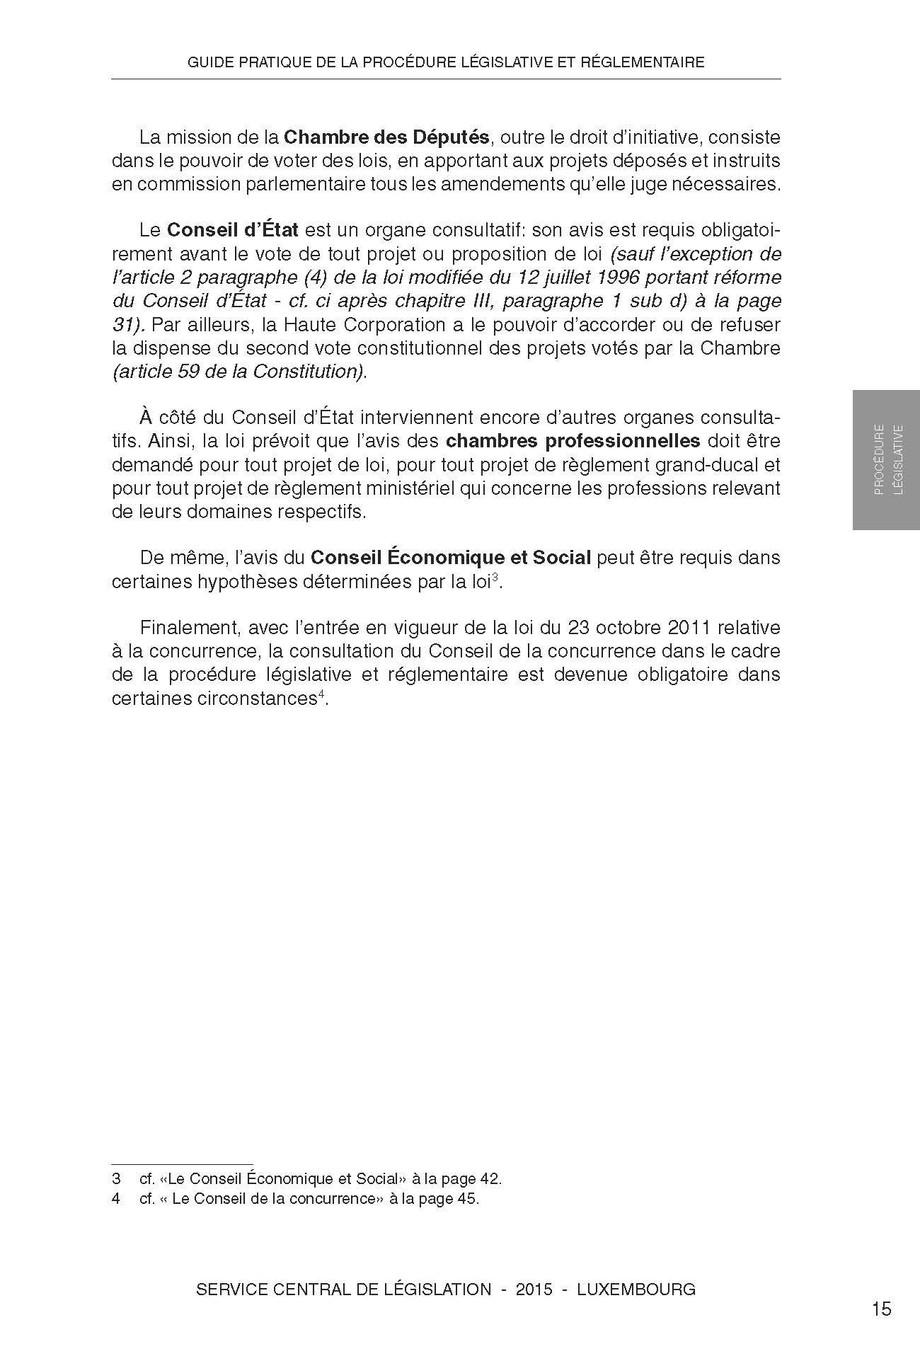 Pages from recueil-procedure_legislative-20150301-fr-pdf_Page_15.jpg